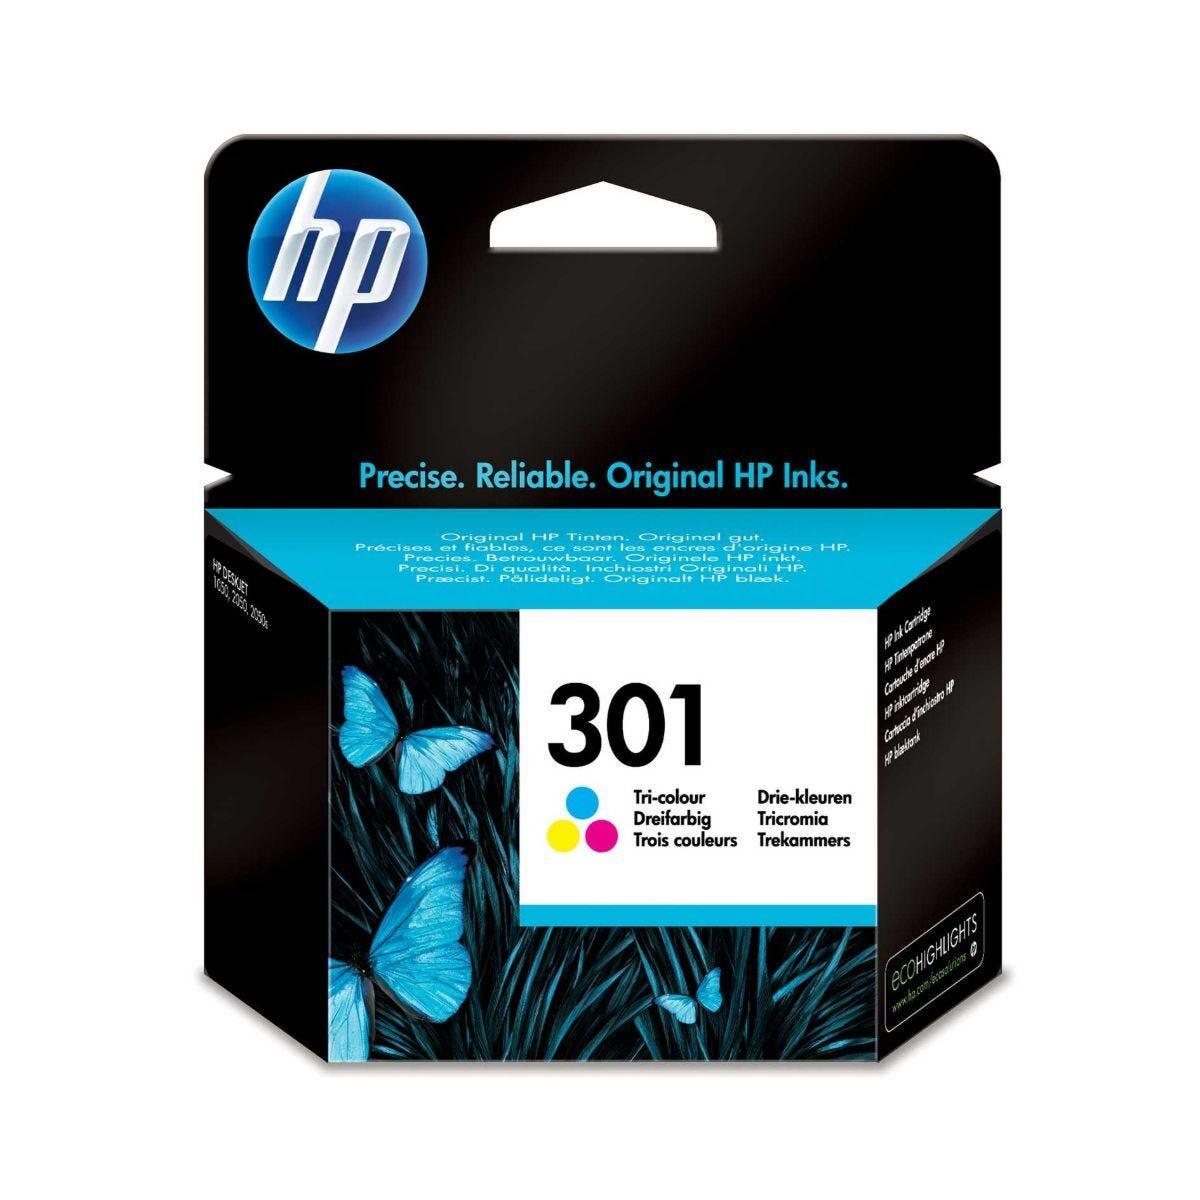 HP Inkjet Cartridge 301 Colour